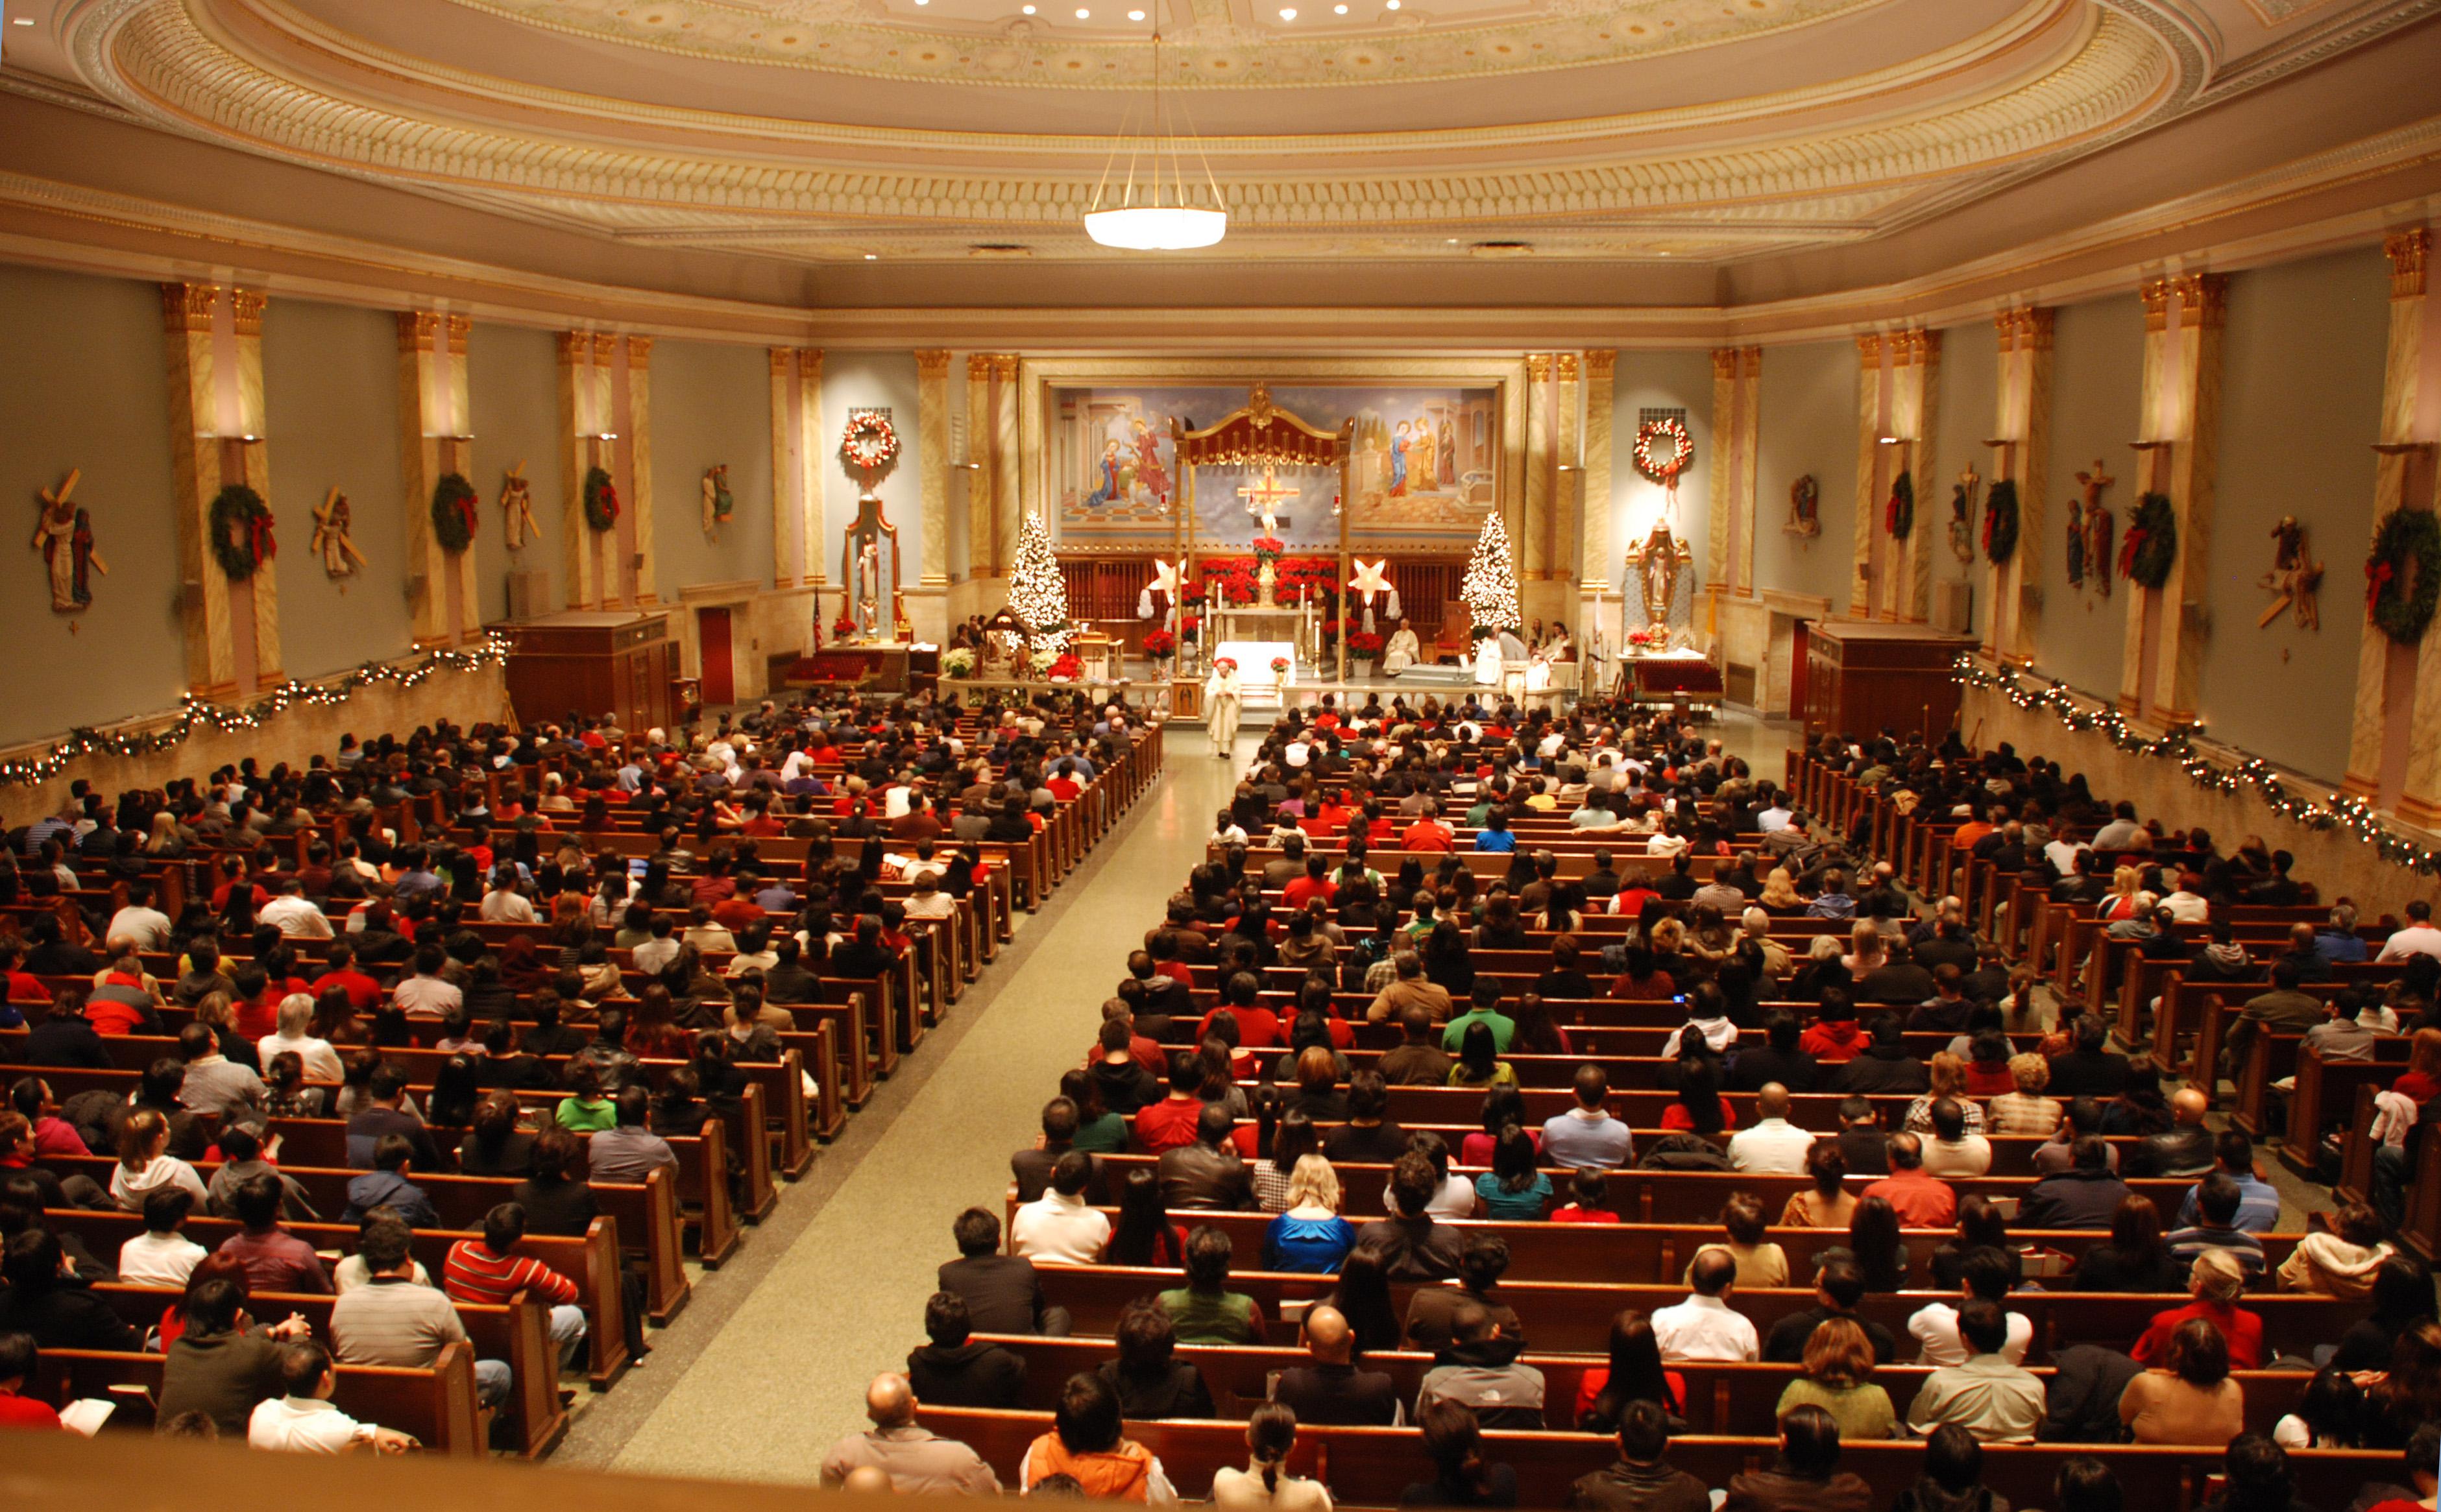 Peru Vermont Church Christmas Services 2020 Church attendance   Wikipedia